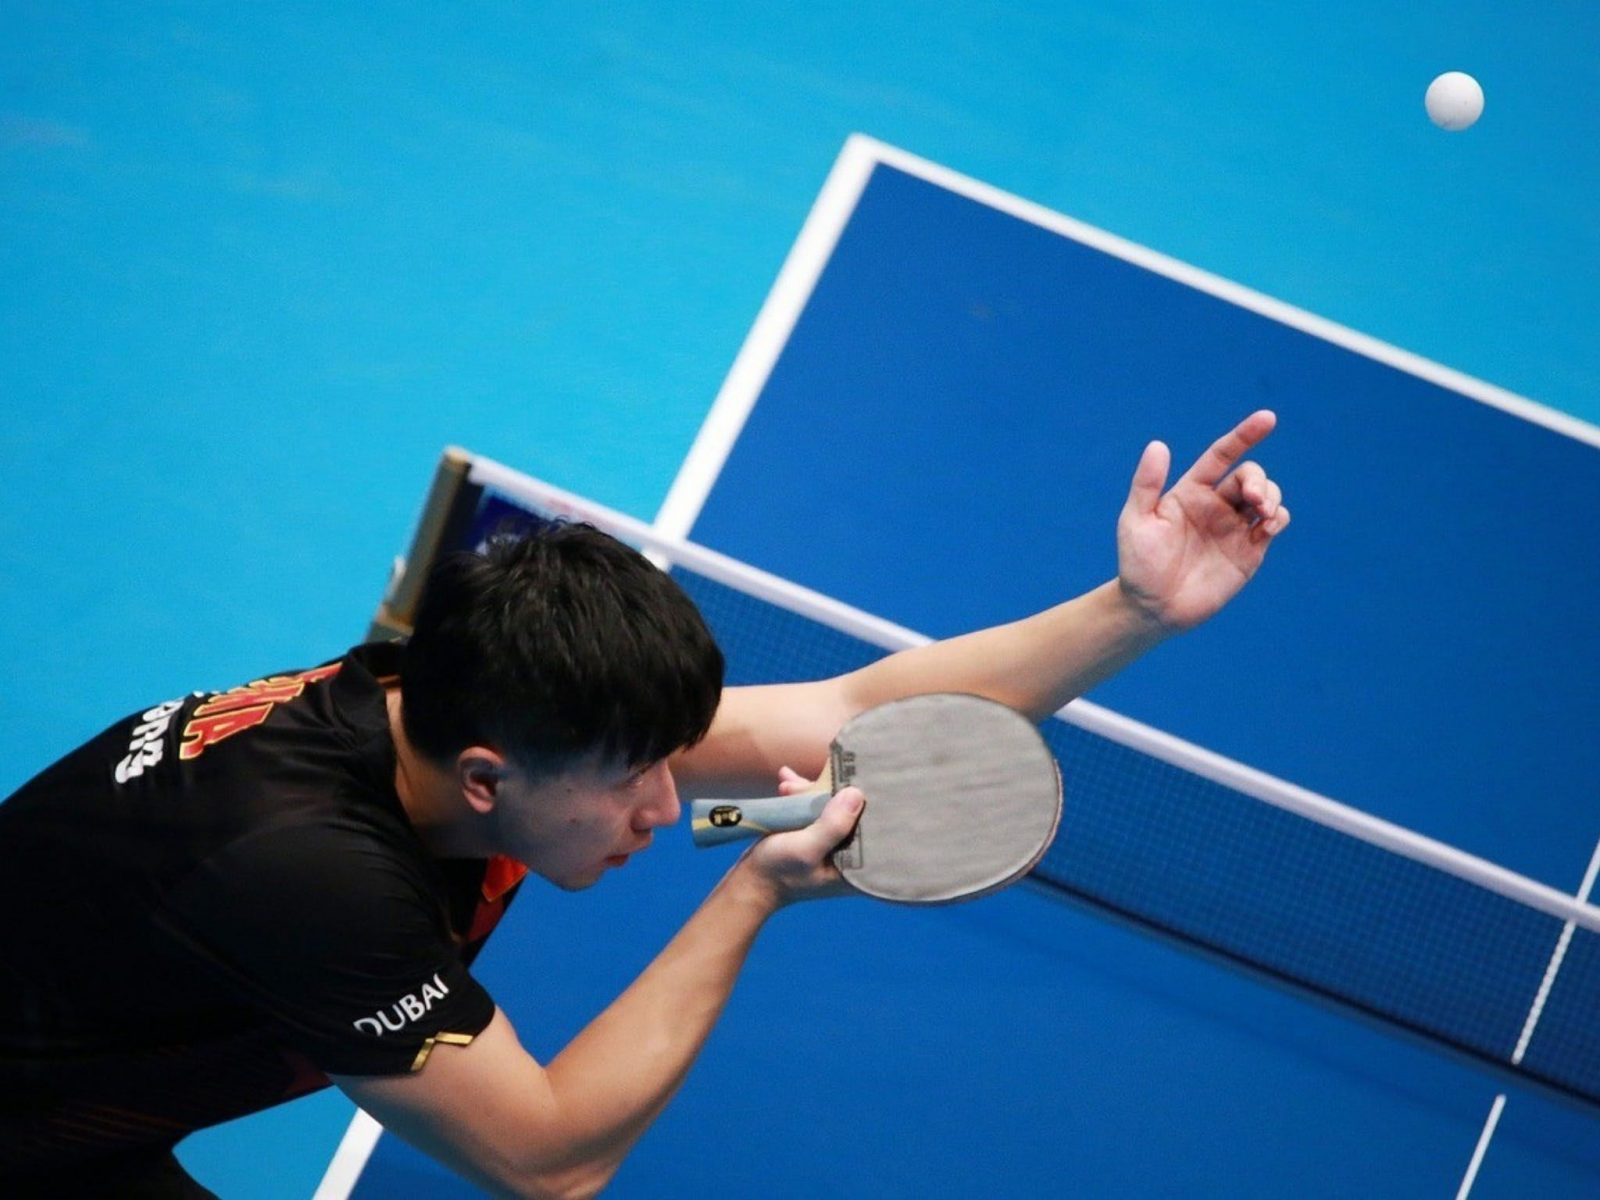 player playing ping pong